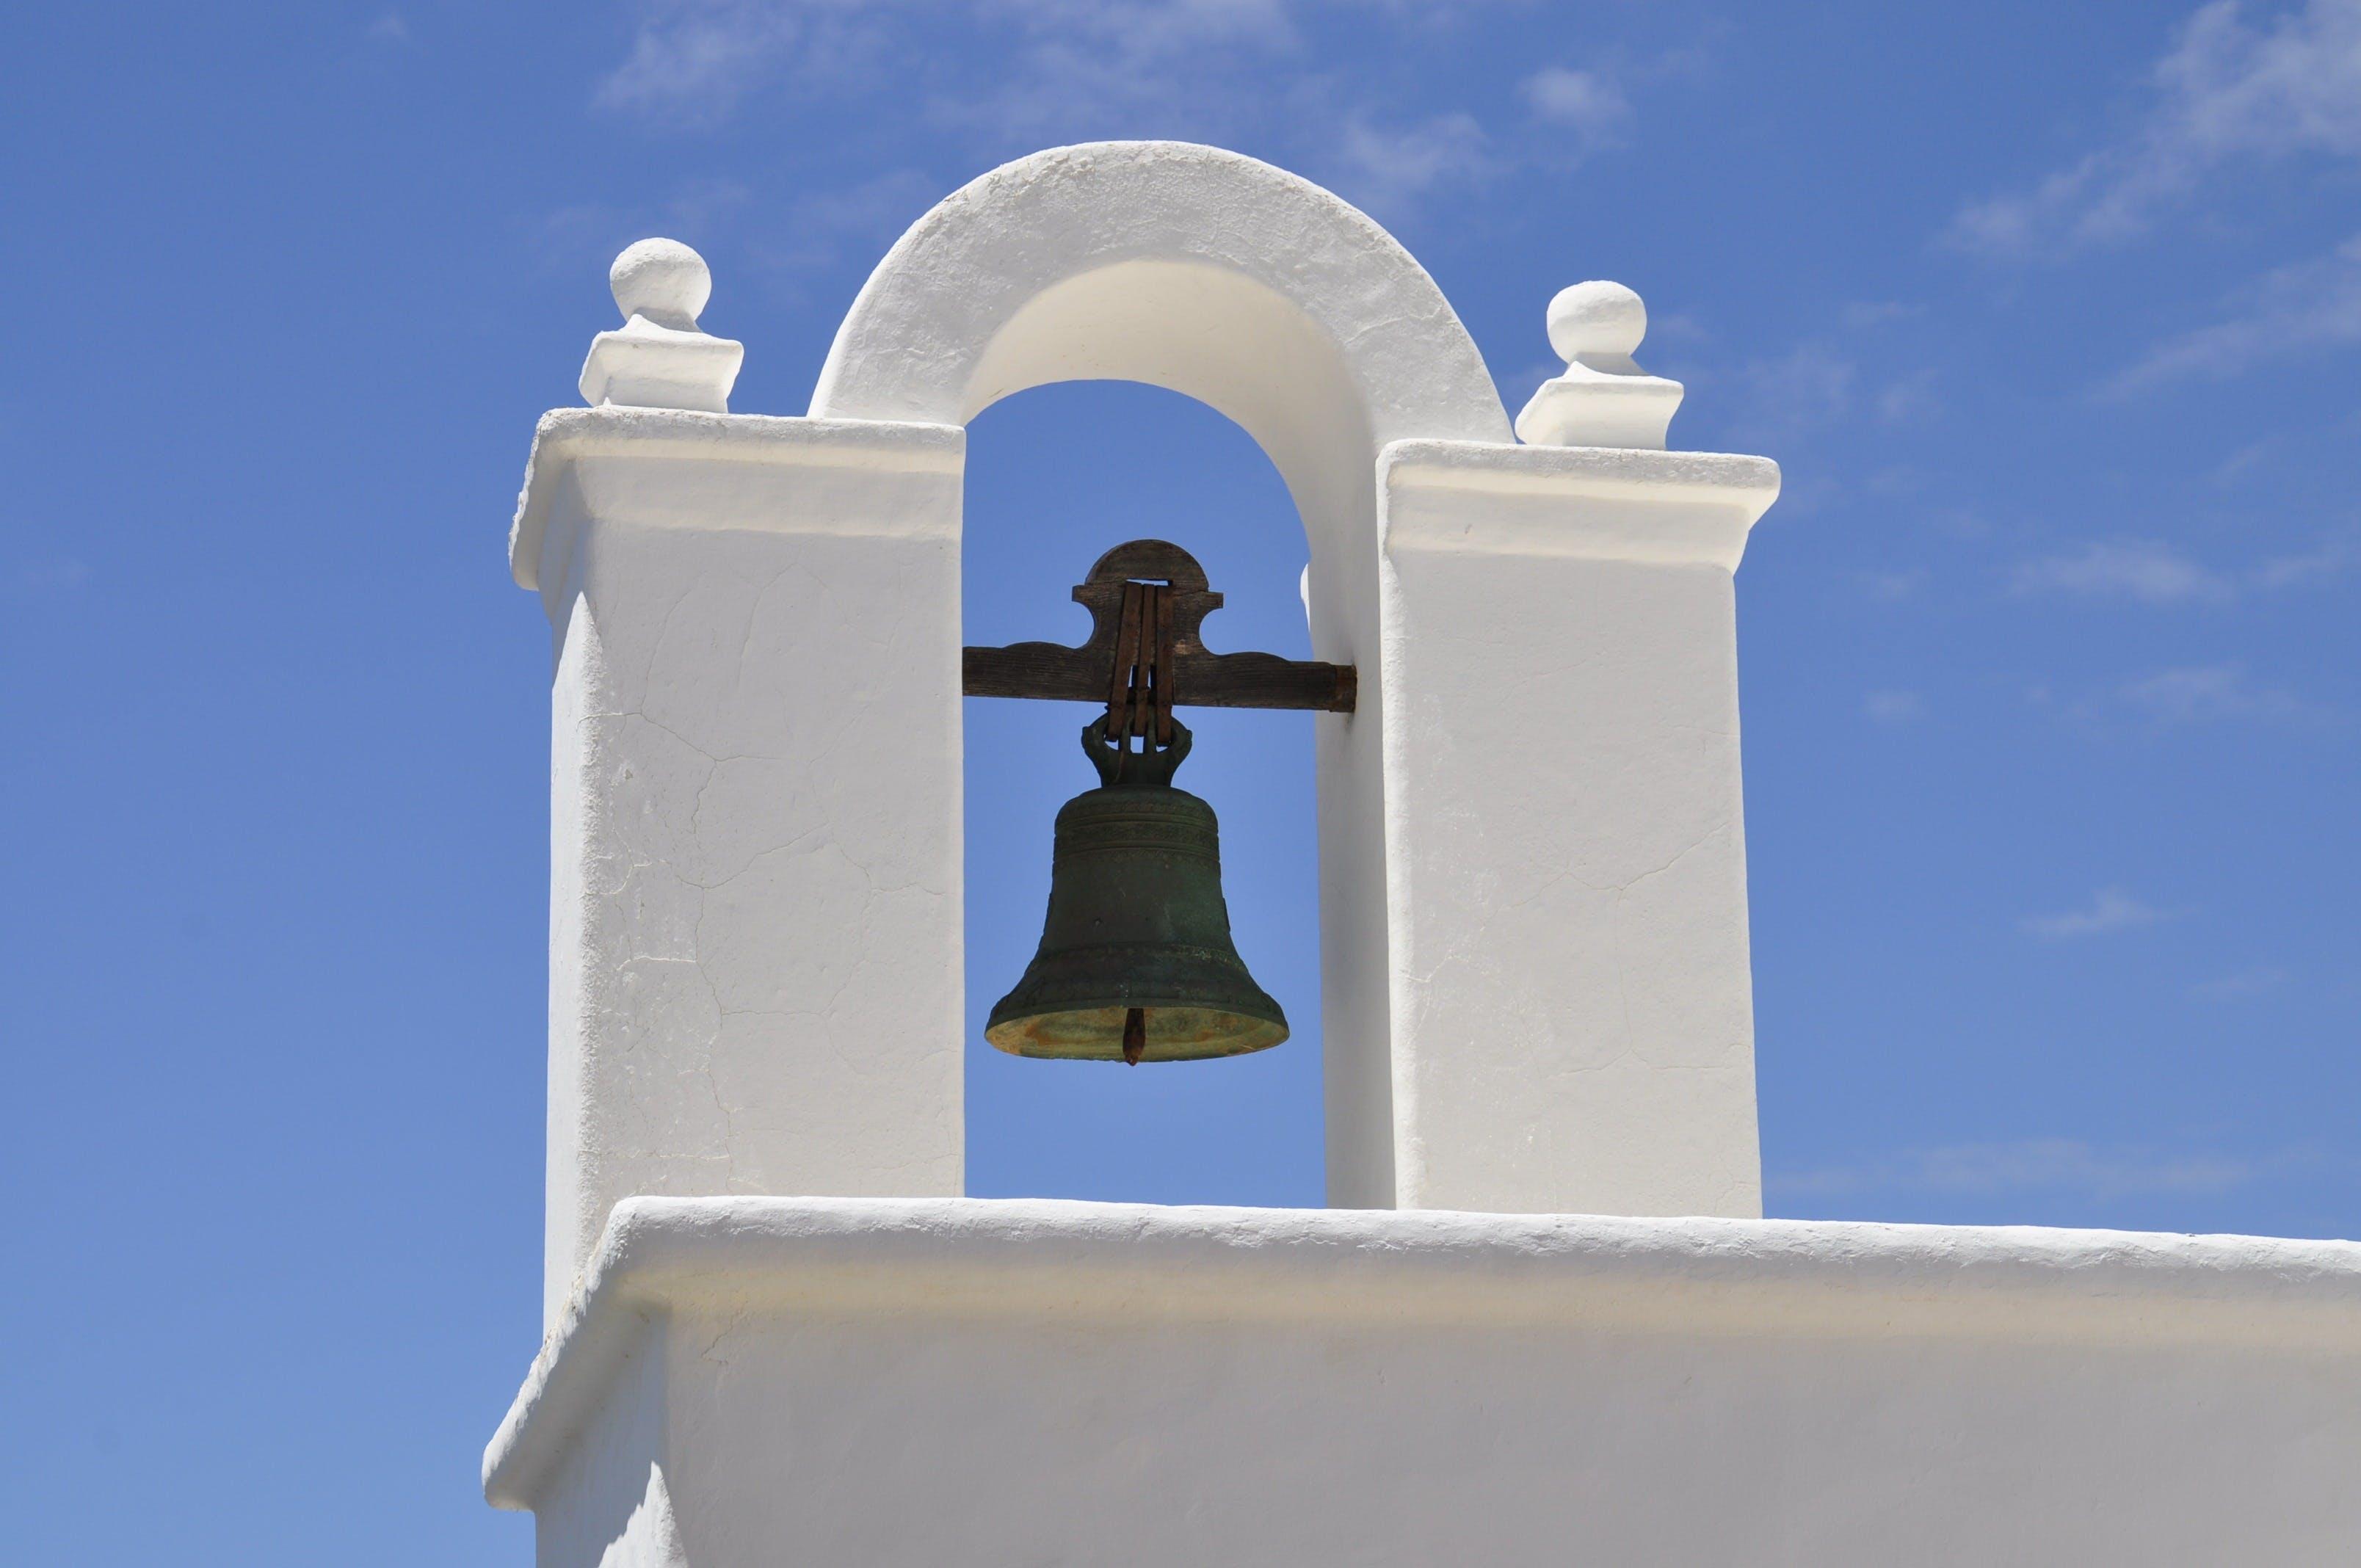 Black Bell during Daytime